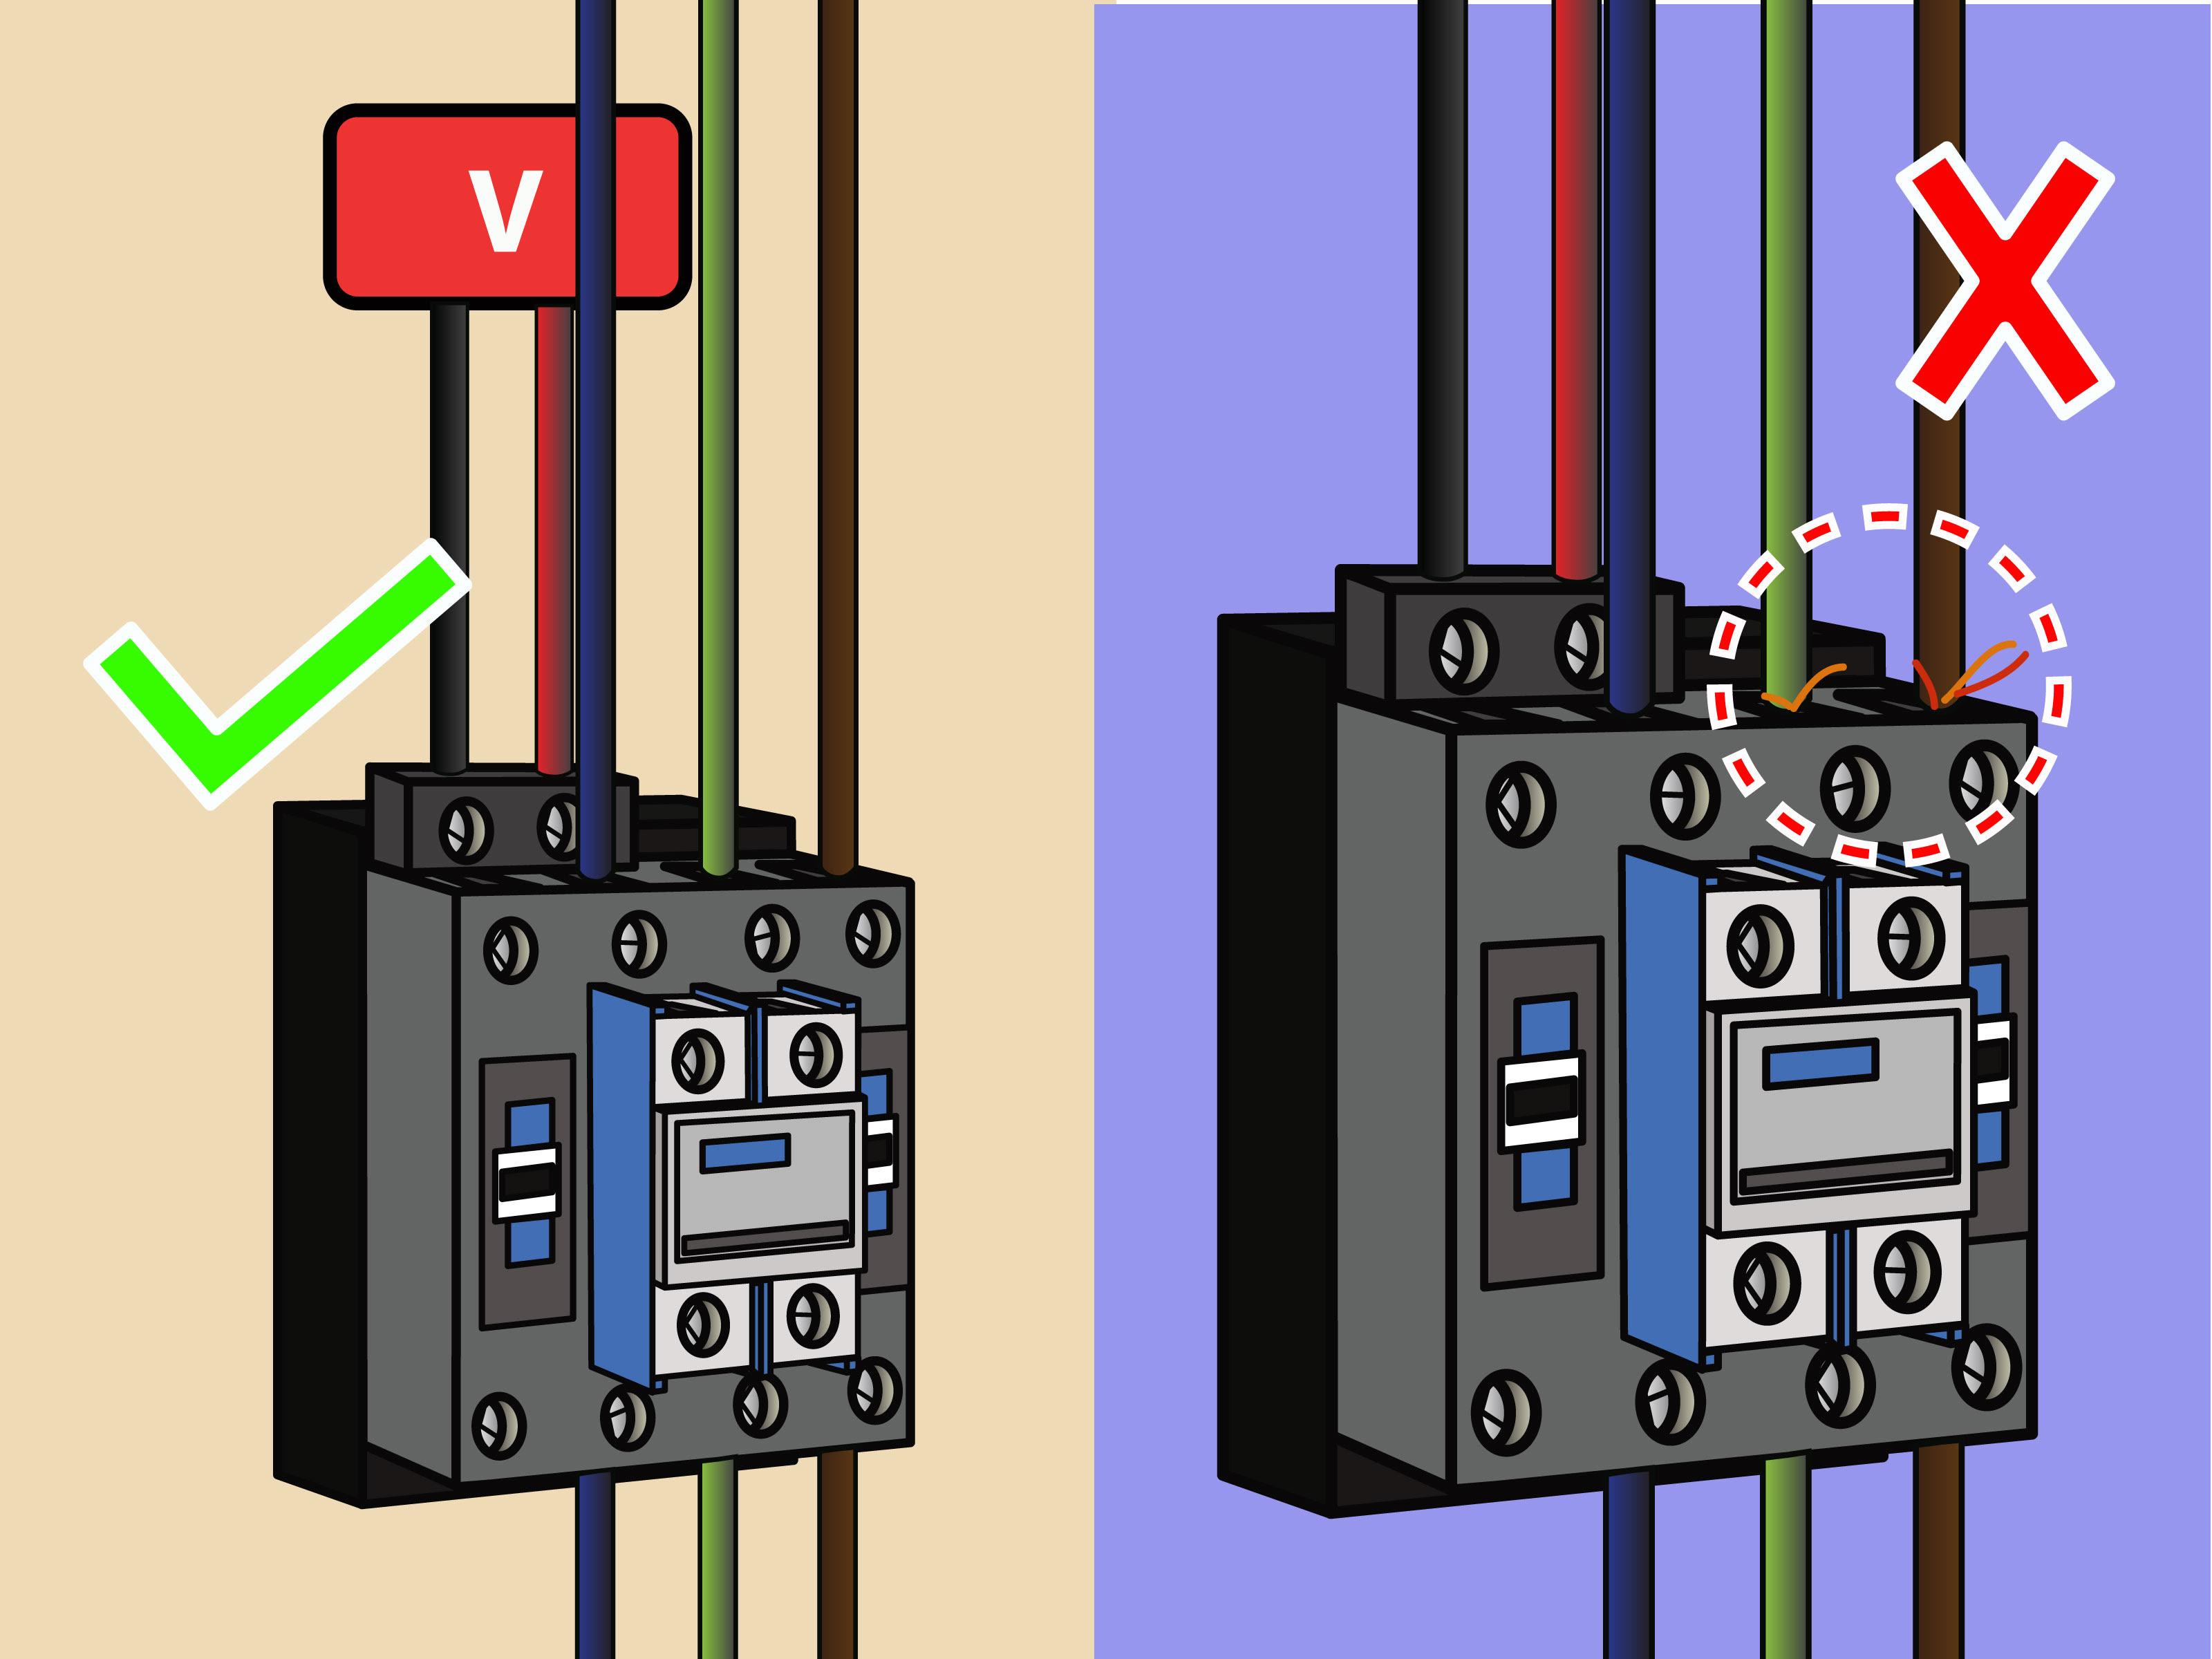 Diagram Latching Contactor Wiring Diagram Full Version Hd Quality Wiring Diagram Diagramildah Macchineassemblaggio It